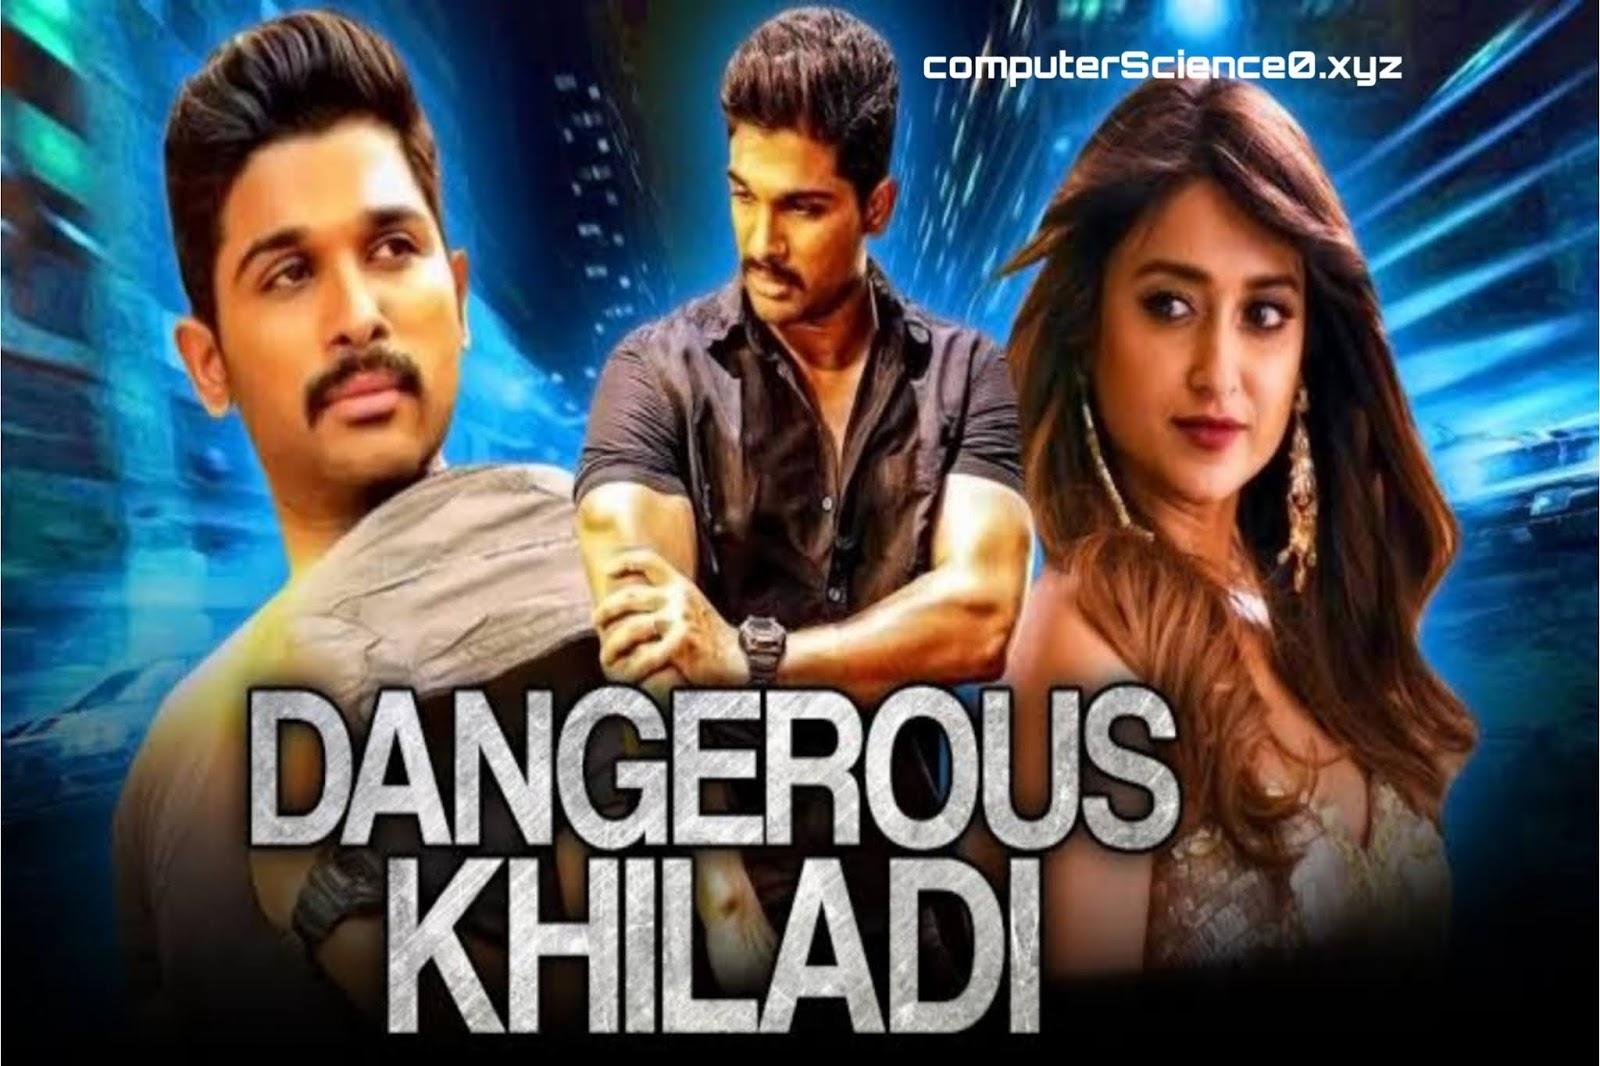 Julayi, Dangerous Khiladi Allu Arjun's Top 19 movies of all time